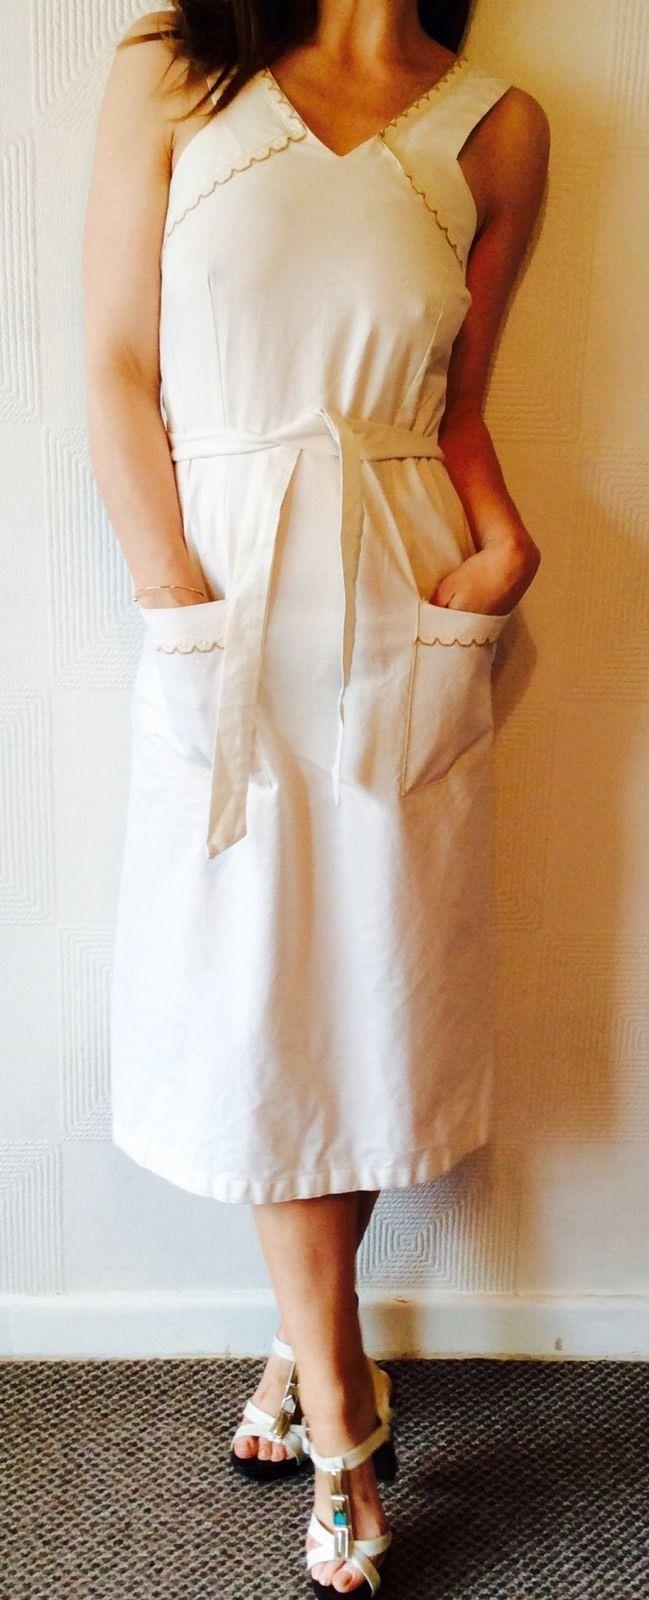 Superb RARE 70s White Cream MIDI Sun Dress Femme Festival Chic Boho Wedding s M | eBay